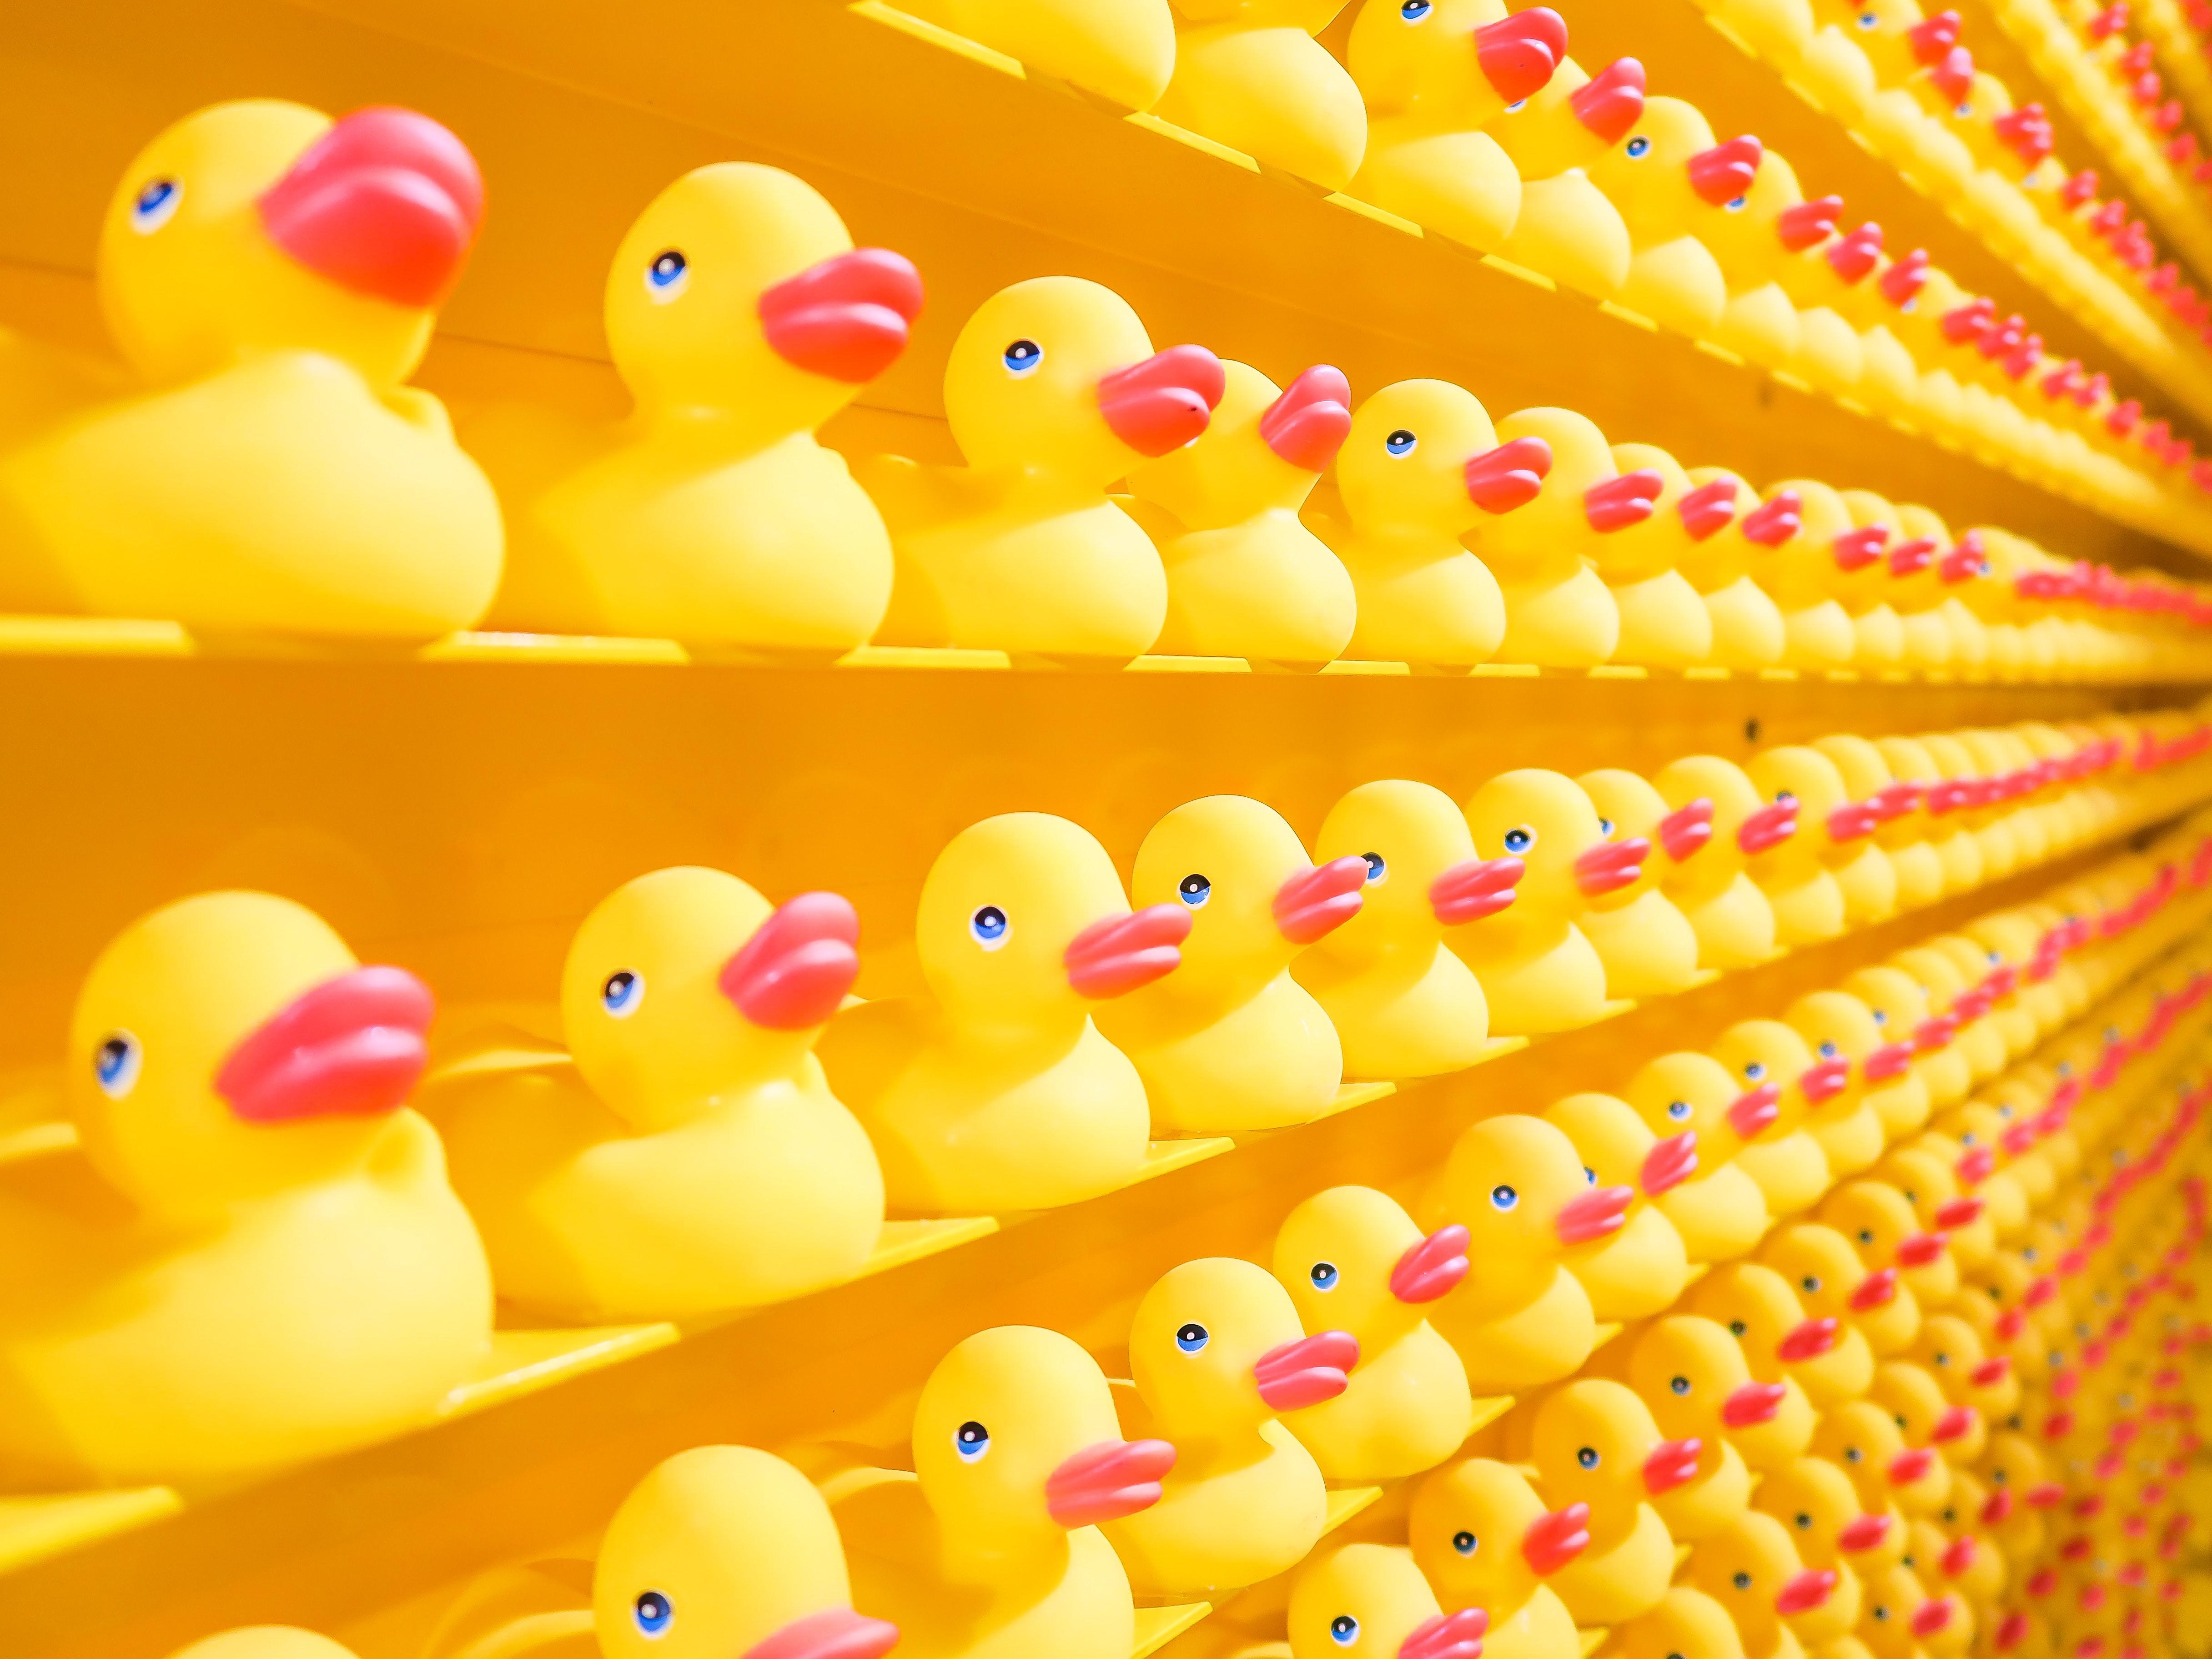 rubber ducks virtual exhibition andy warhol contemporary classic frida khalo google travel localbini biniblog rubber ducks contemporary art virtual exhibition